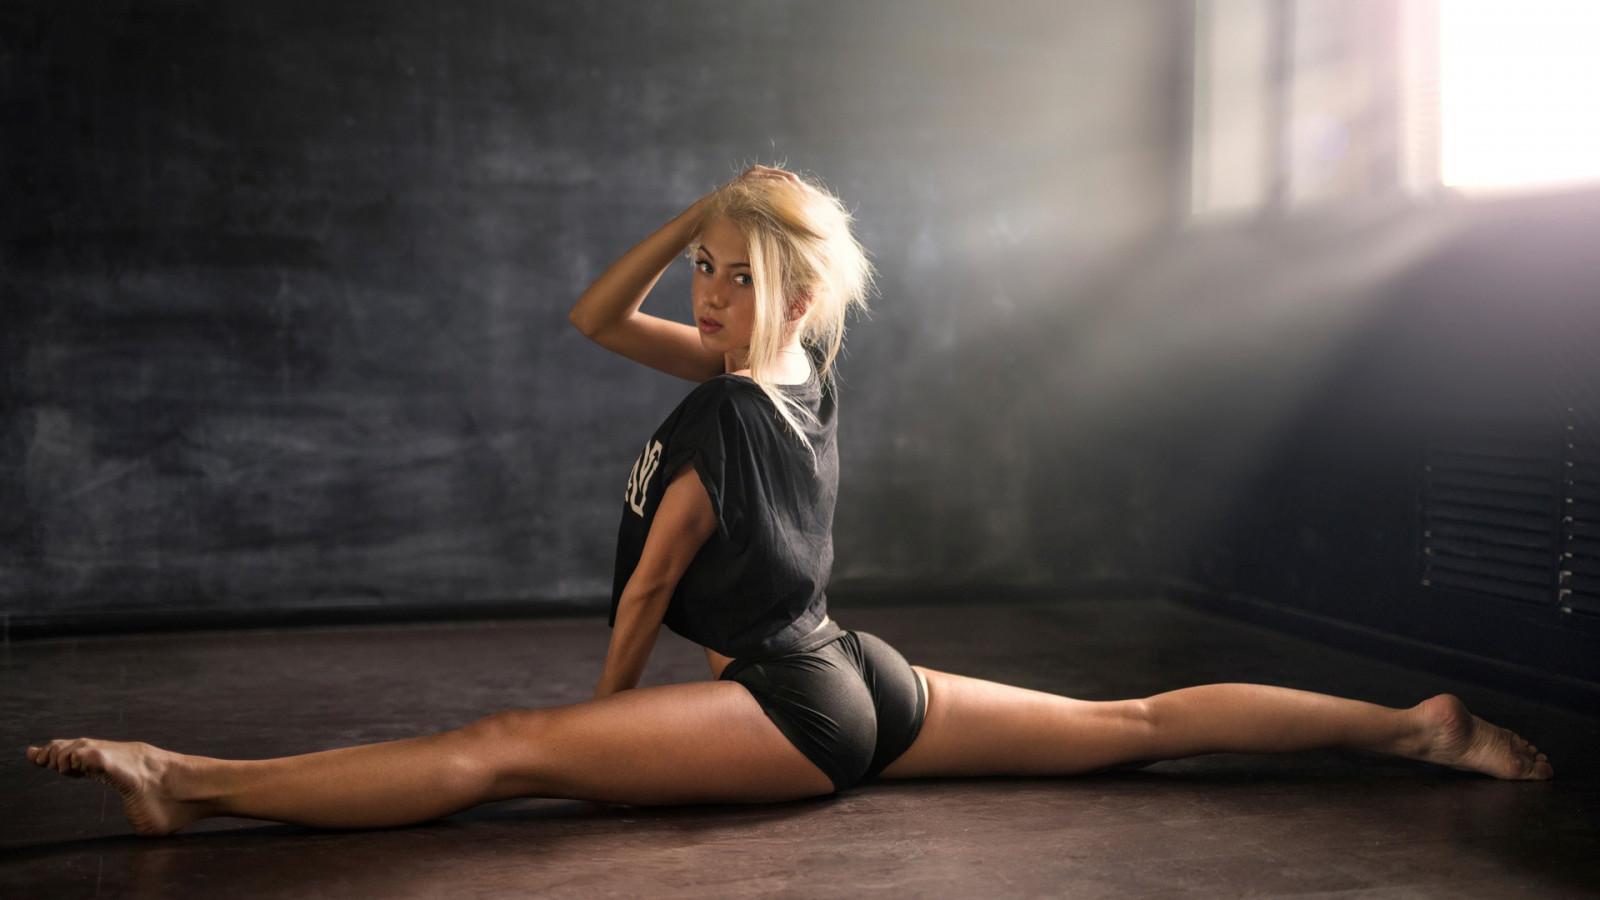 Wallpaper  Sports, Women, Blonde, Straight Hair, Long -7907